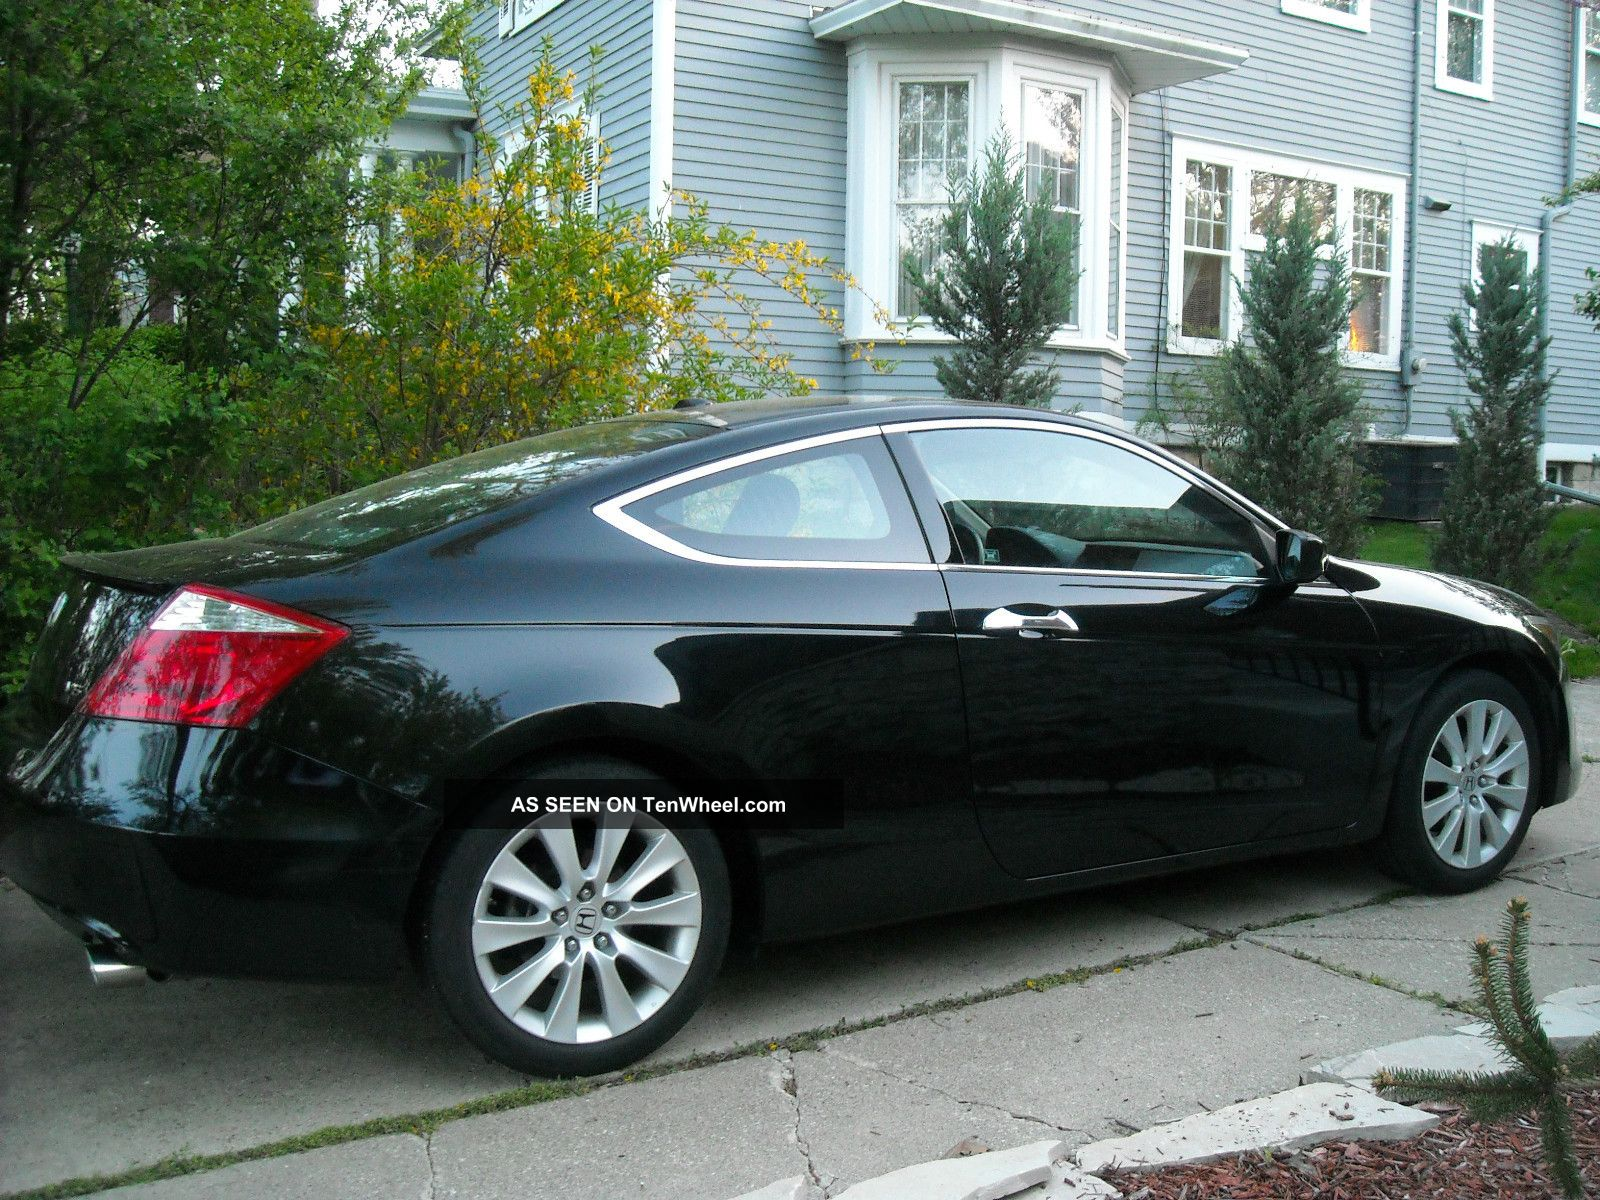 2008 Honda Accord Coupe,  Exl,  V6,  Black,  38k Mile Accord photo